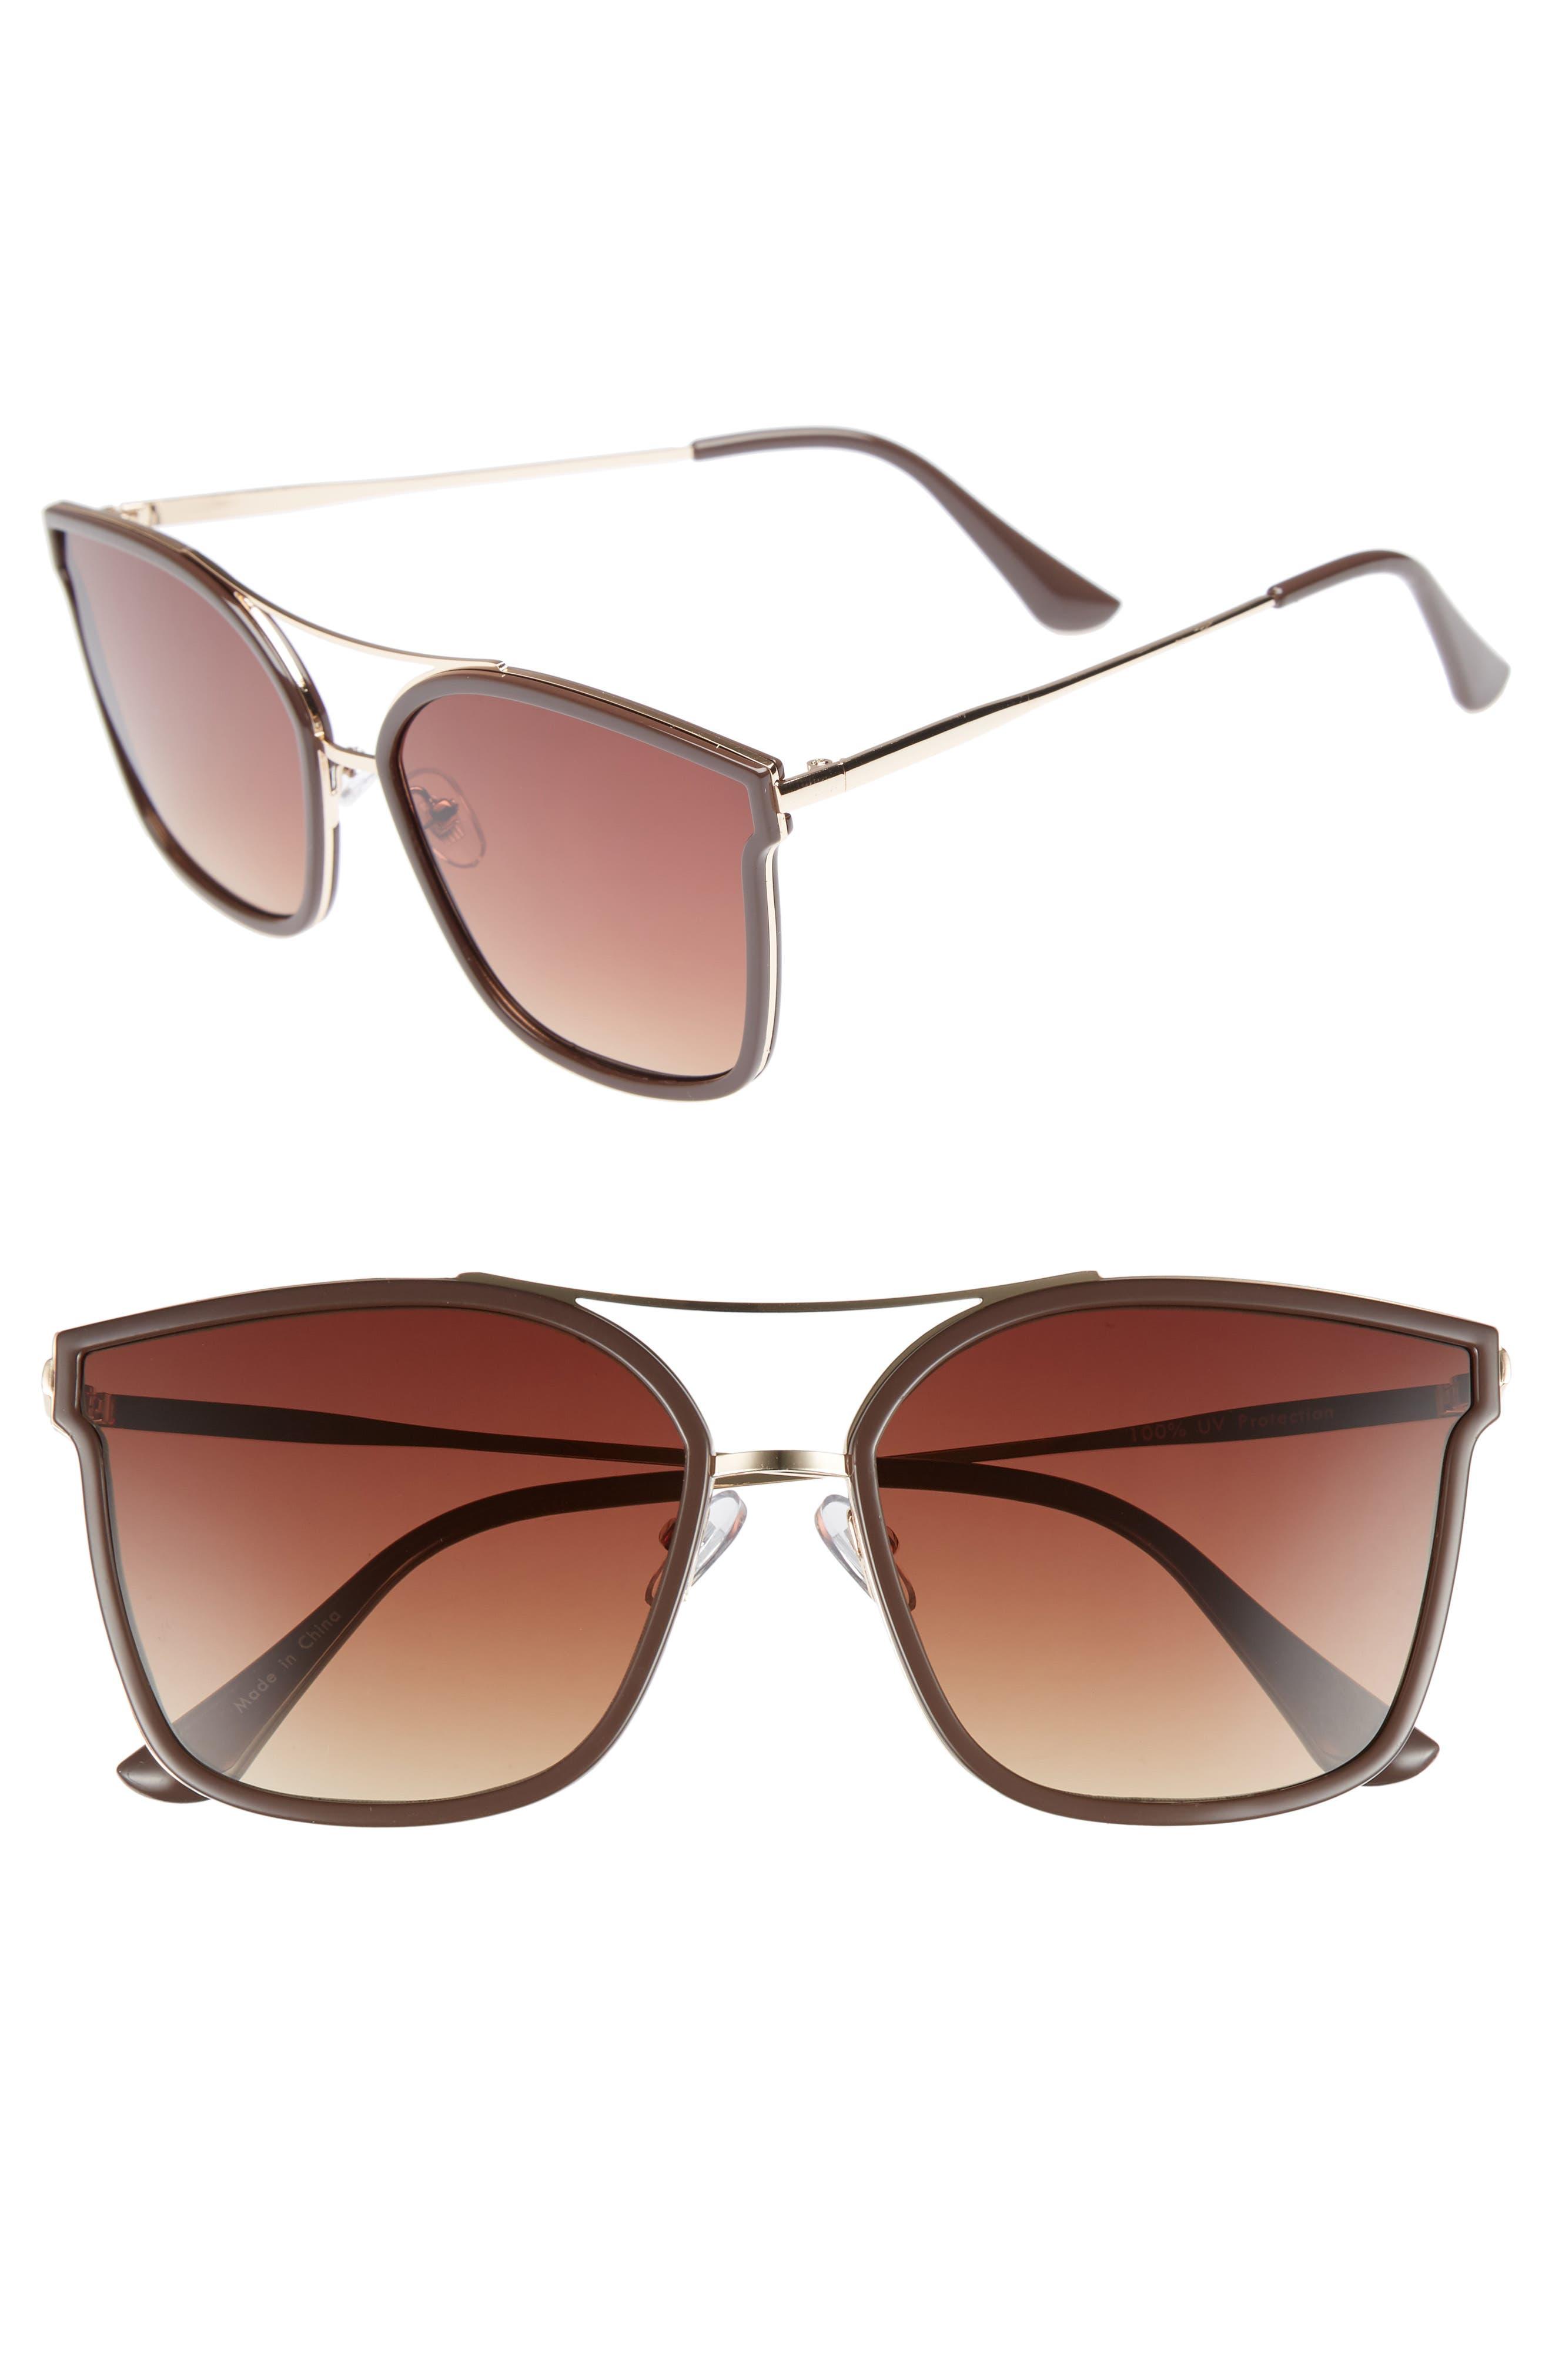 60mm Cat Eye Sunglasses,                         Main,                         color, Gold/ Brown